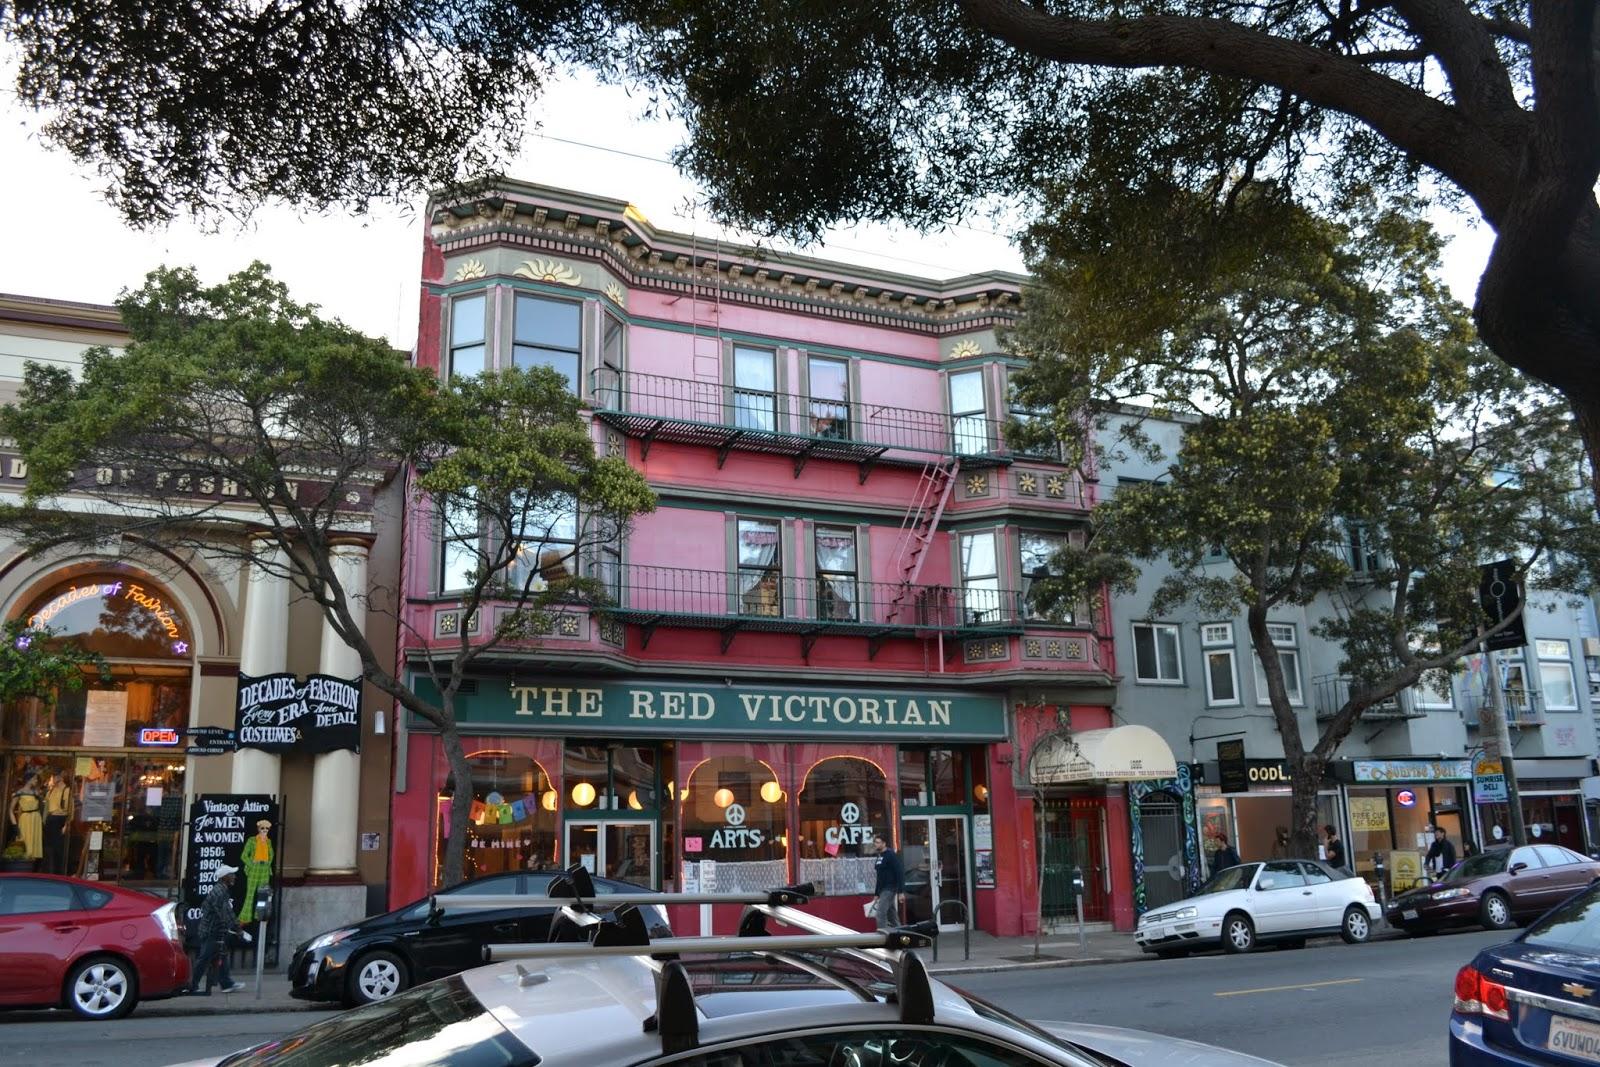 Отель Ред Викториан, Хейт-Эшбери, Сан-Франциско, Калифорния (The Red Victorian, Haight-Ashbury, San Francisco, CA)